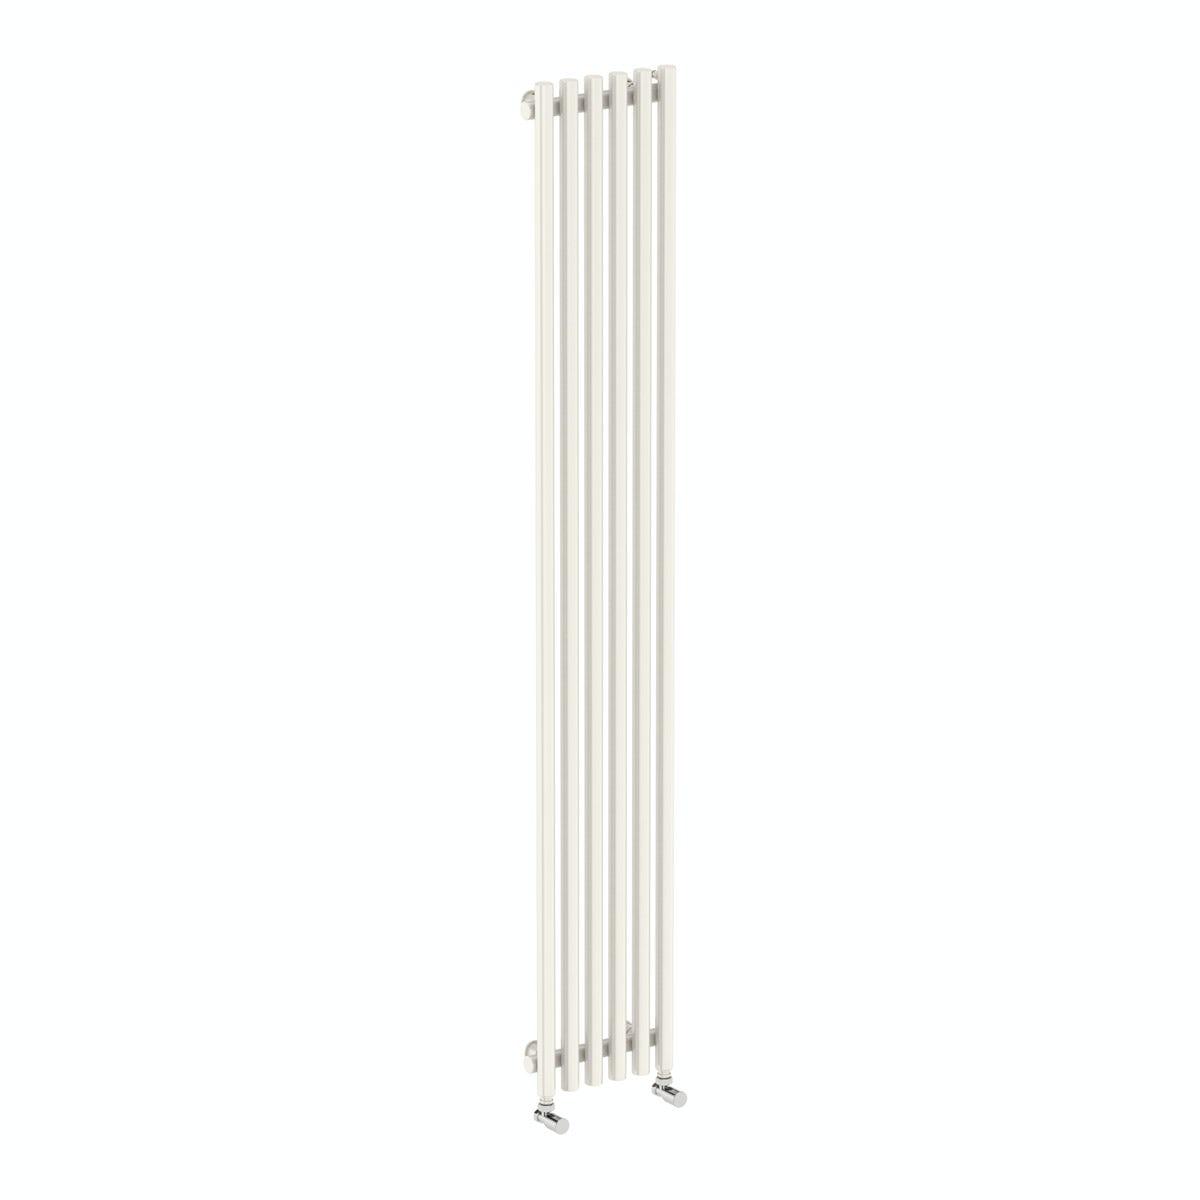 Terma Tune soft white single vertical radiator 1800 x 290